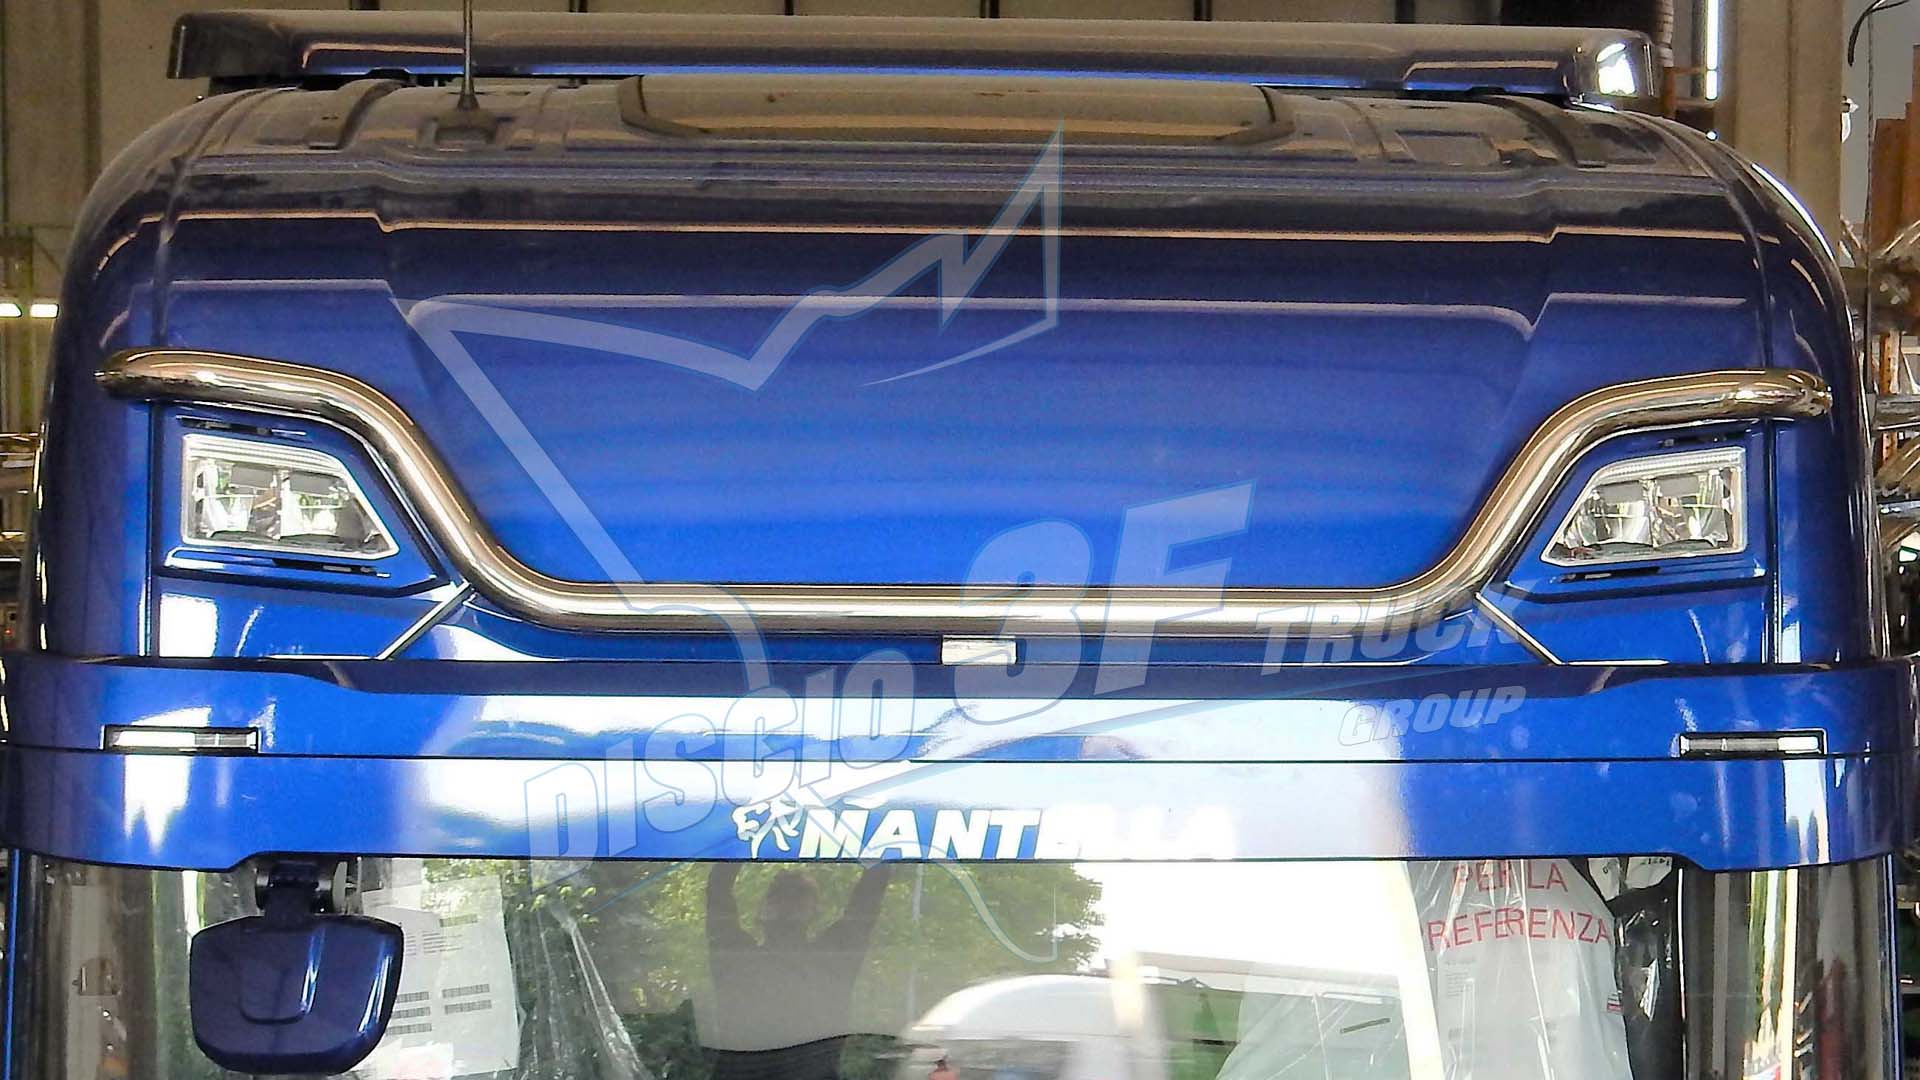 Palo Sopra Visiera CTC, Scania N/G